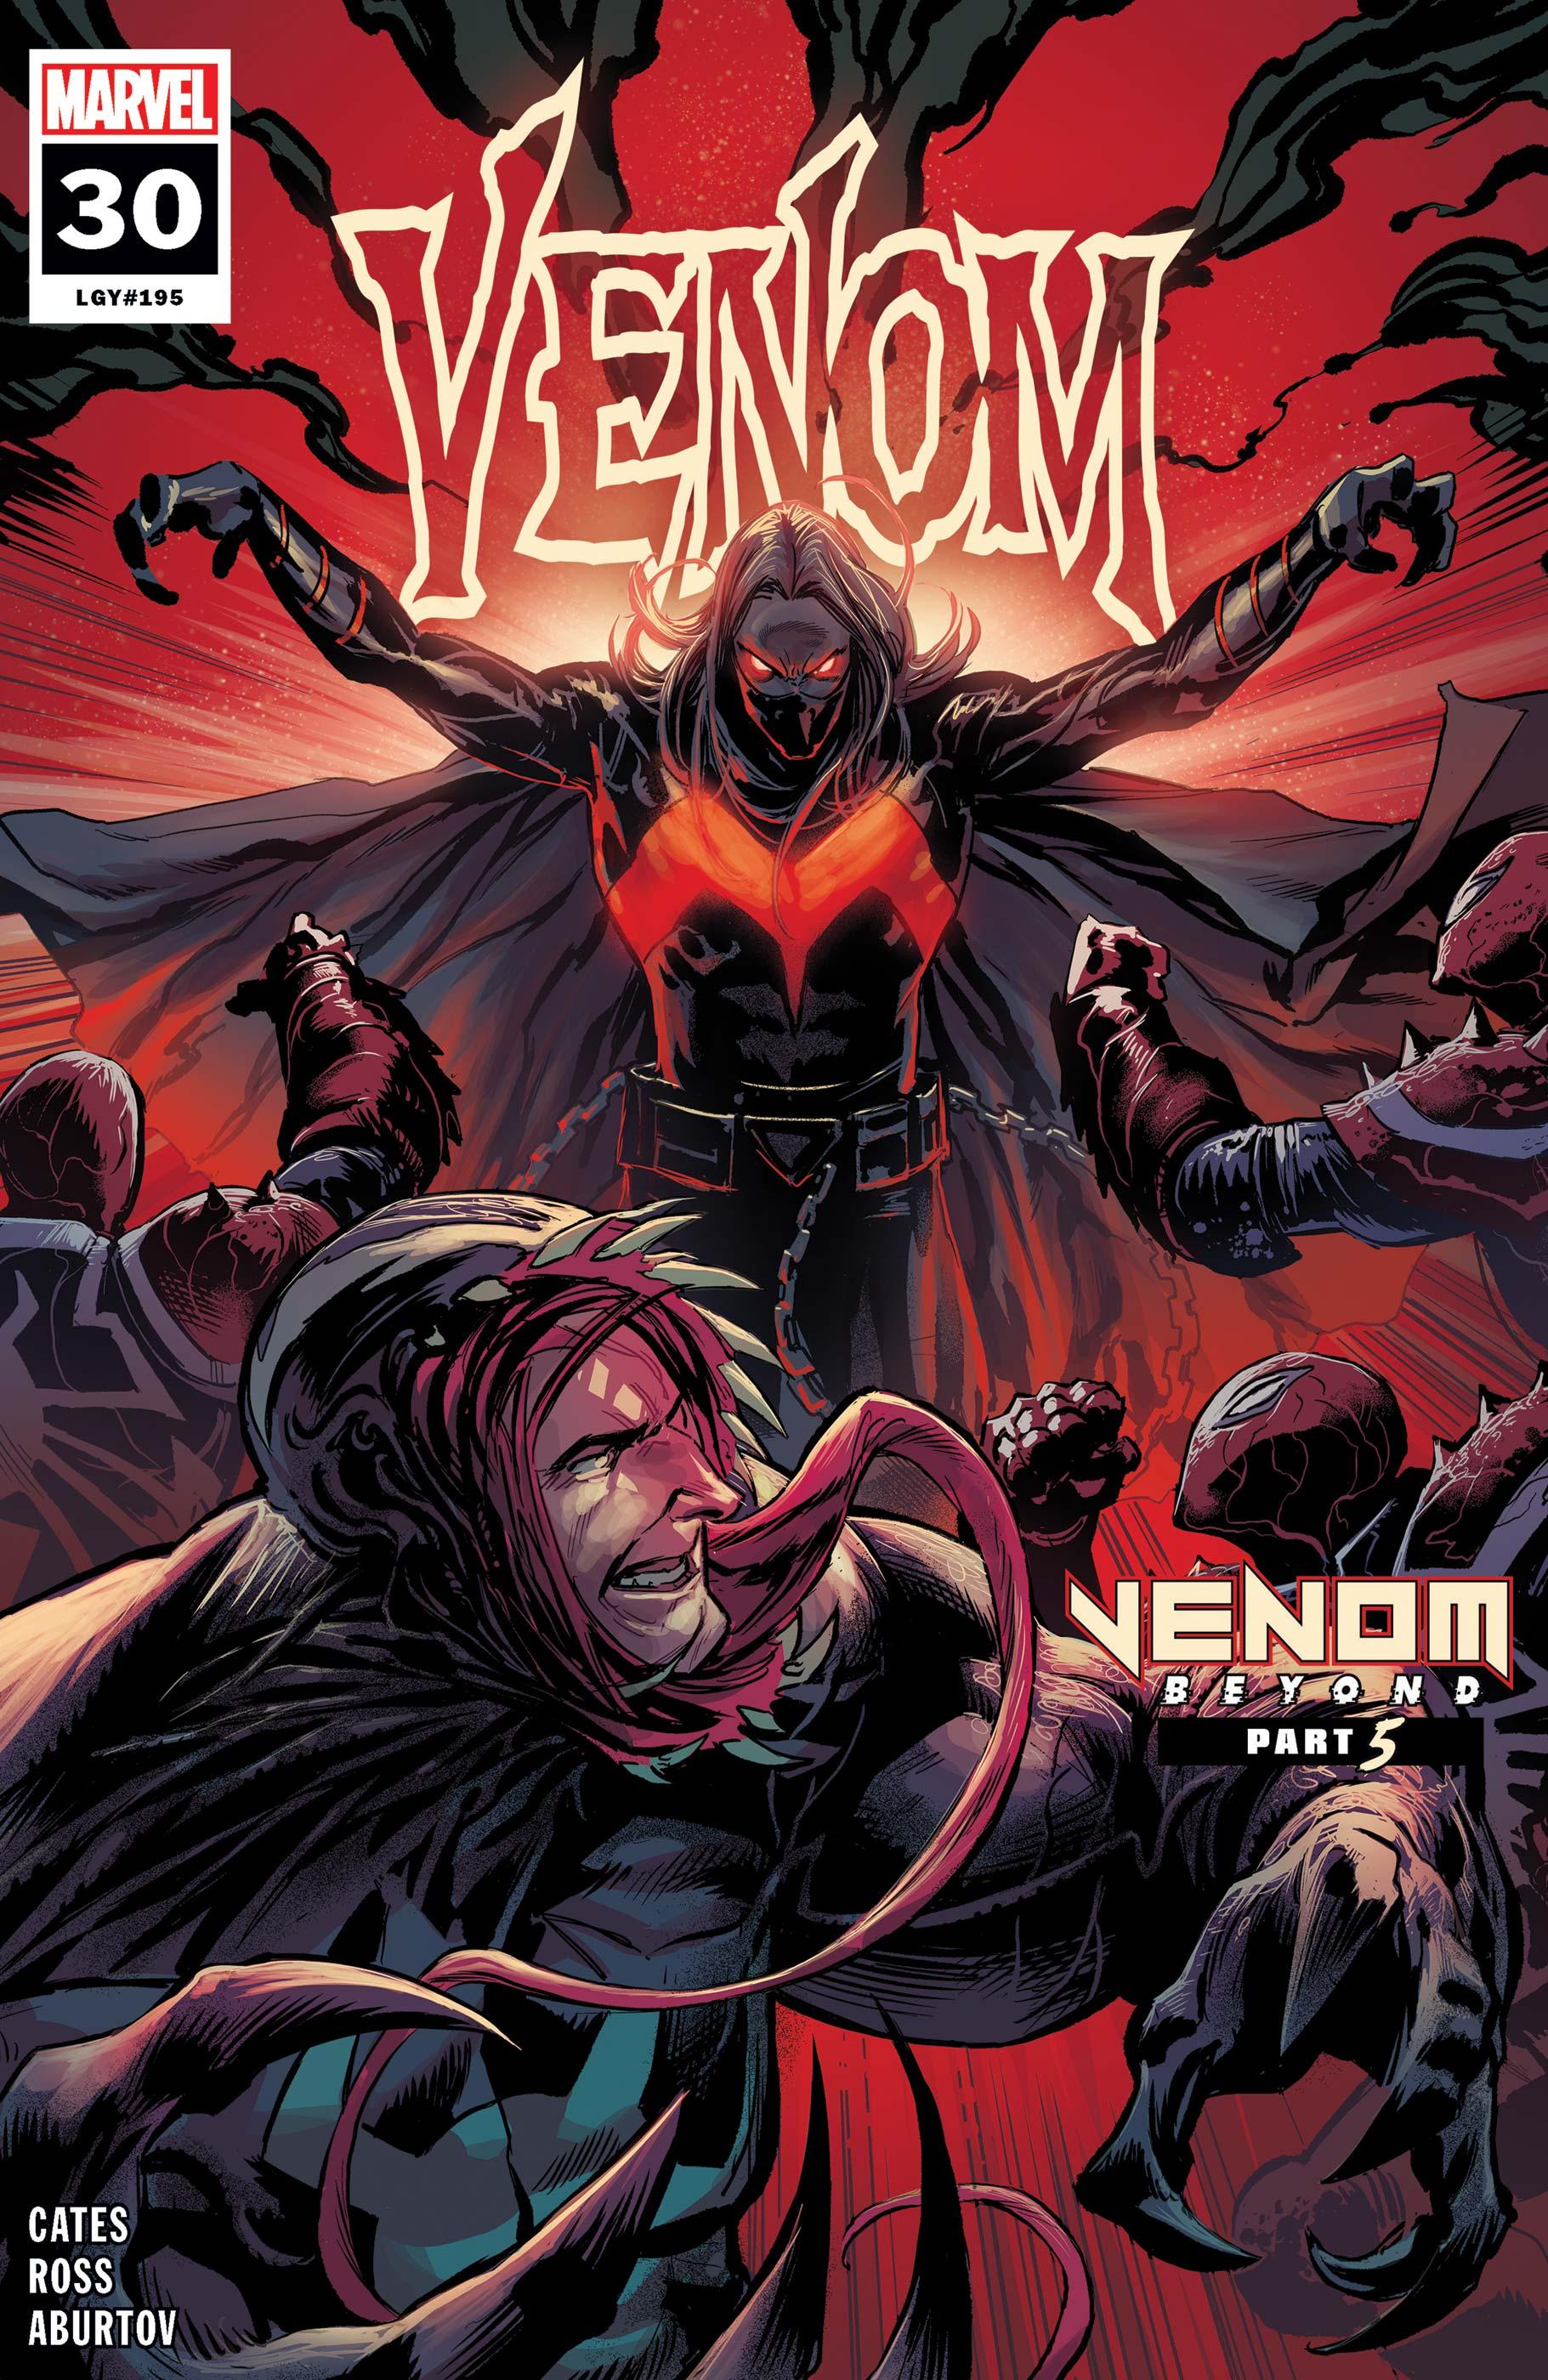 Venom (2018) #30